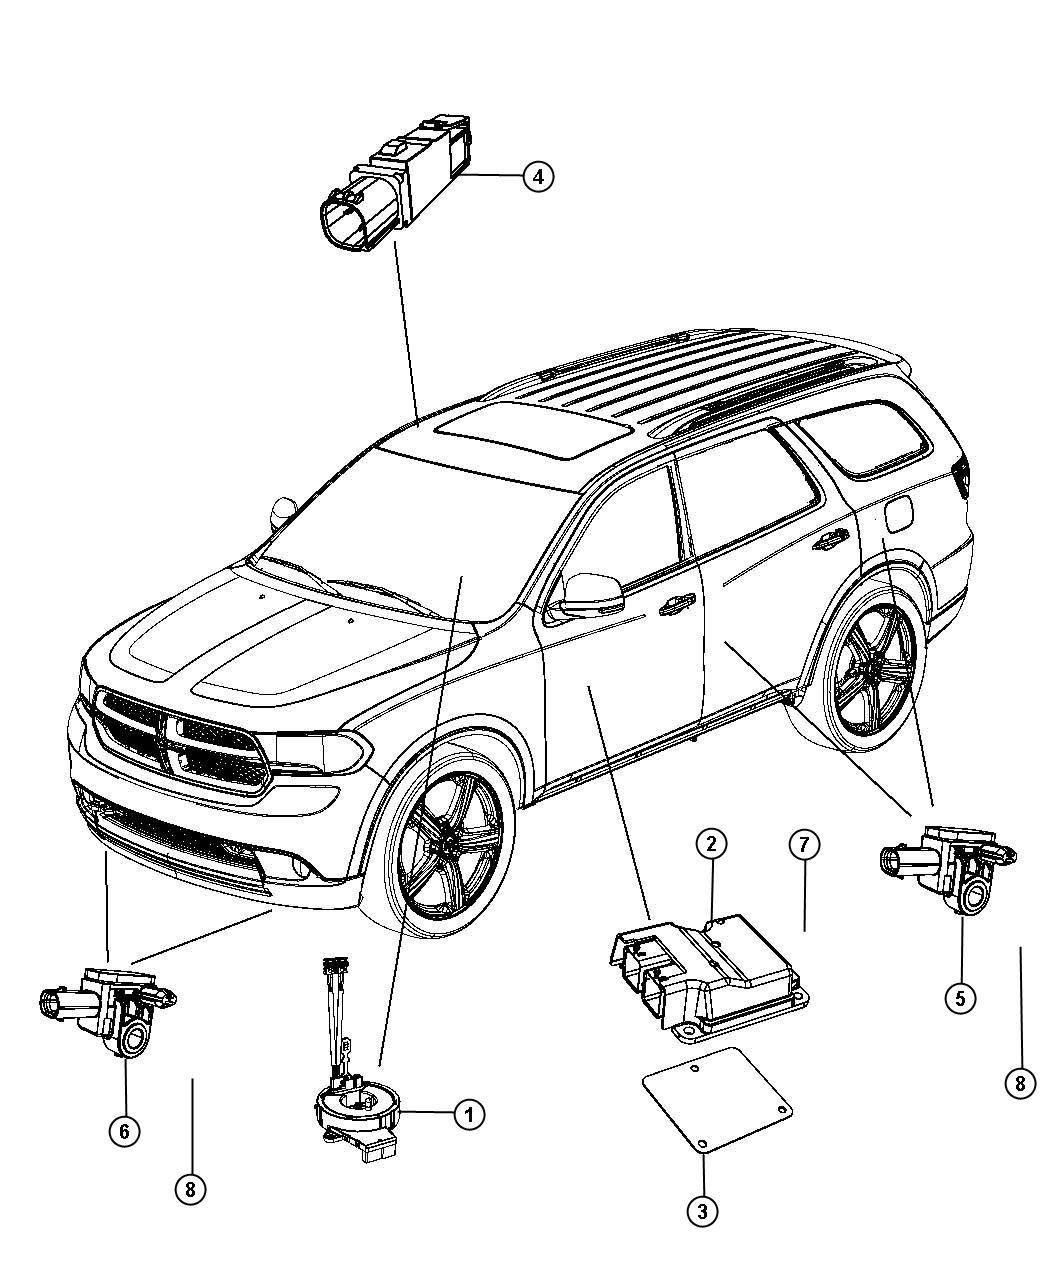 2013 Dodge Durango Module. Occupant restraint. [cf9], [cfp